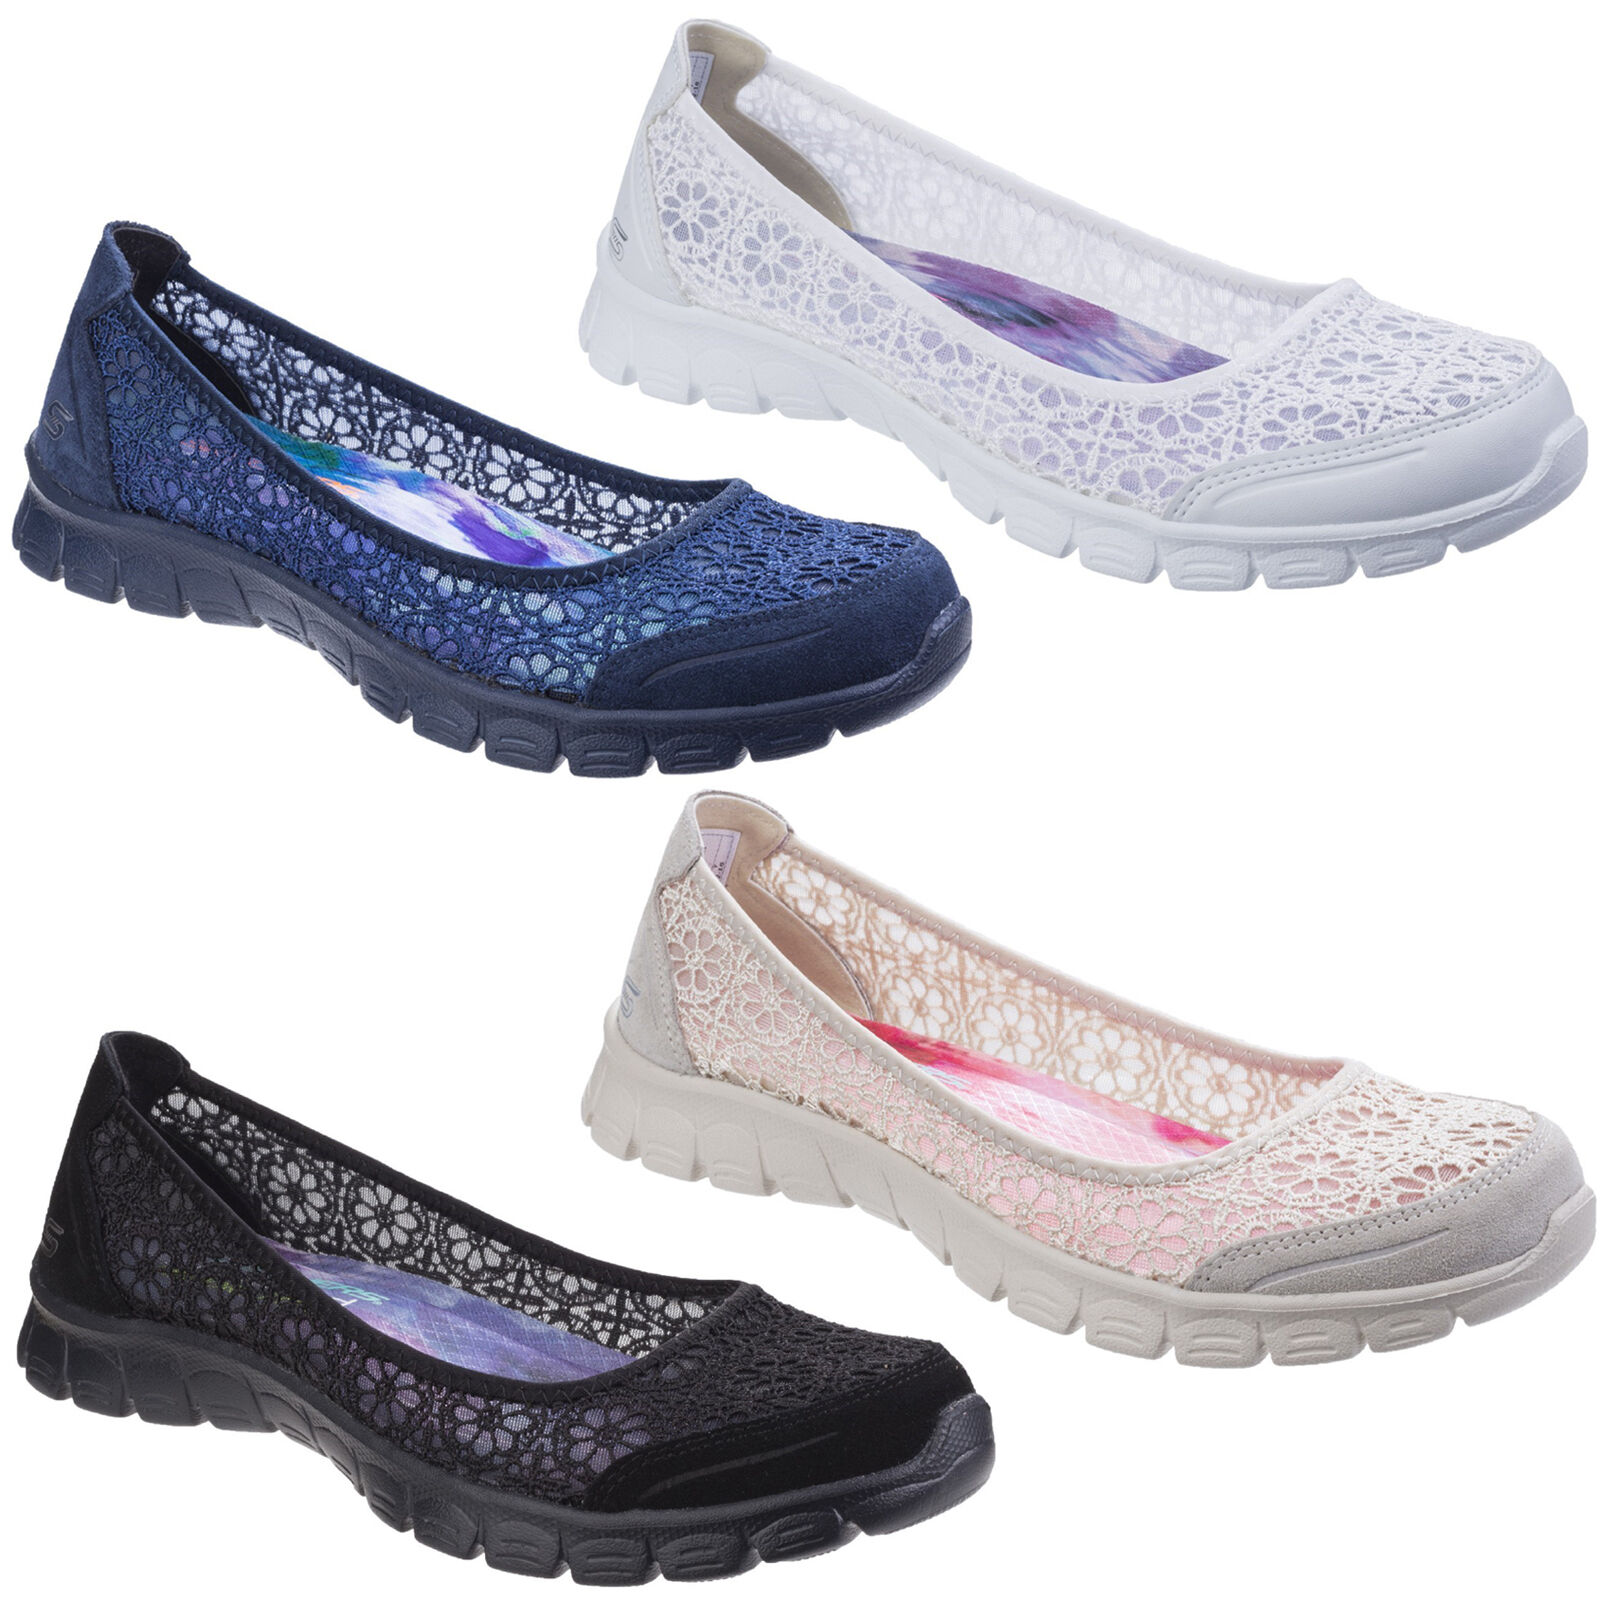 Skechers EZ Flex 3.0 Majesty Flats Damenschuhe Memory Foam Foam Foam Slip On Schuhes UK3-8 b97da2